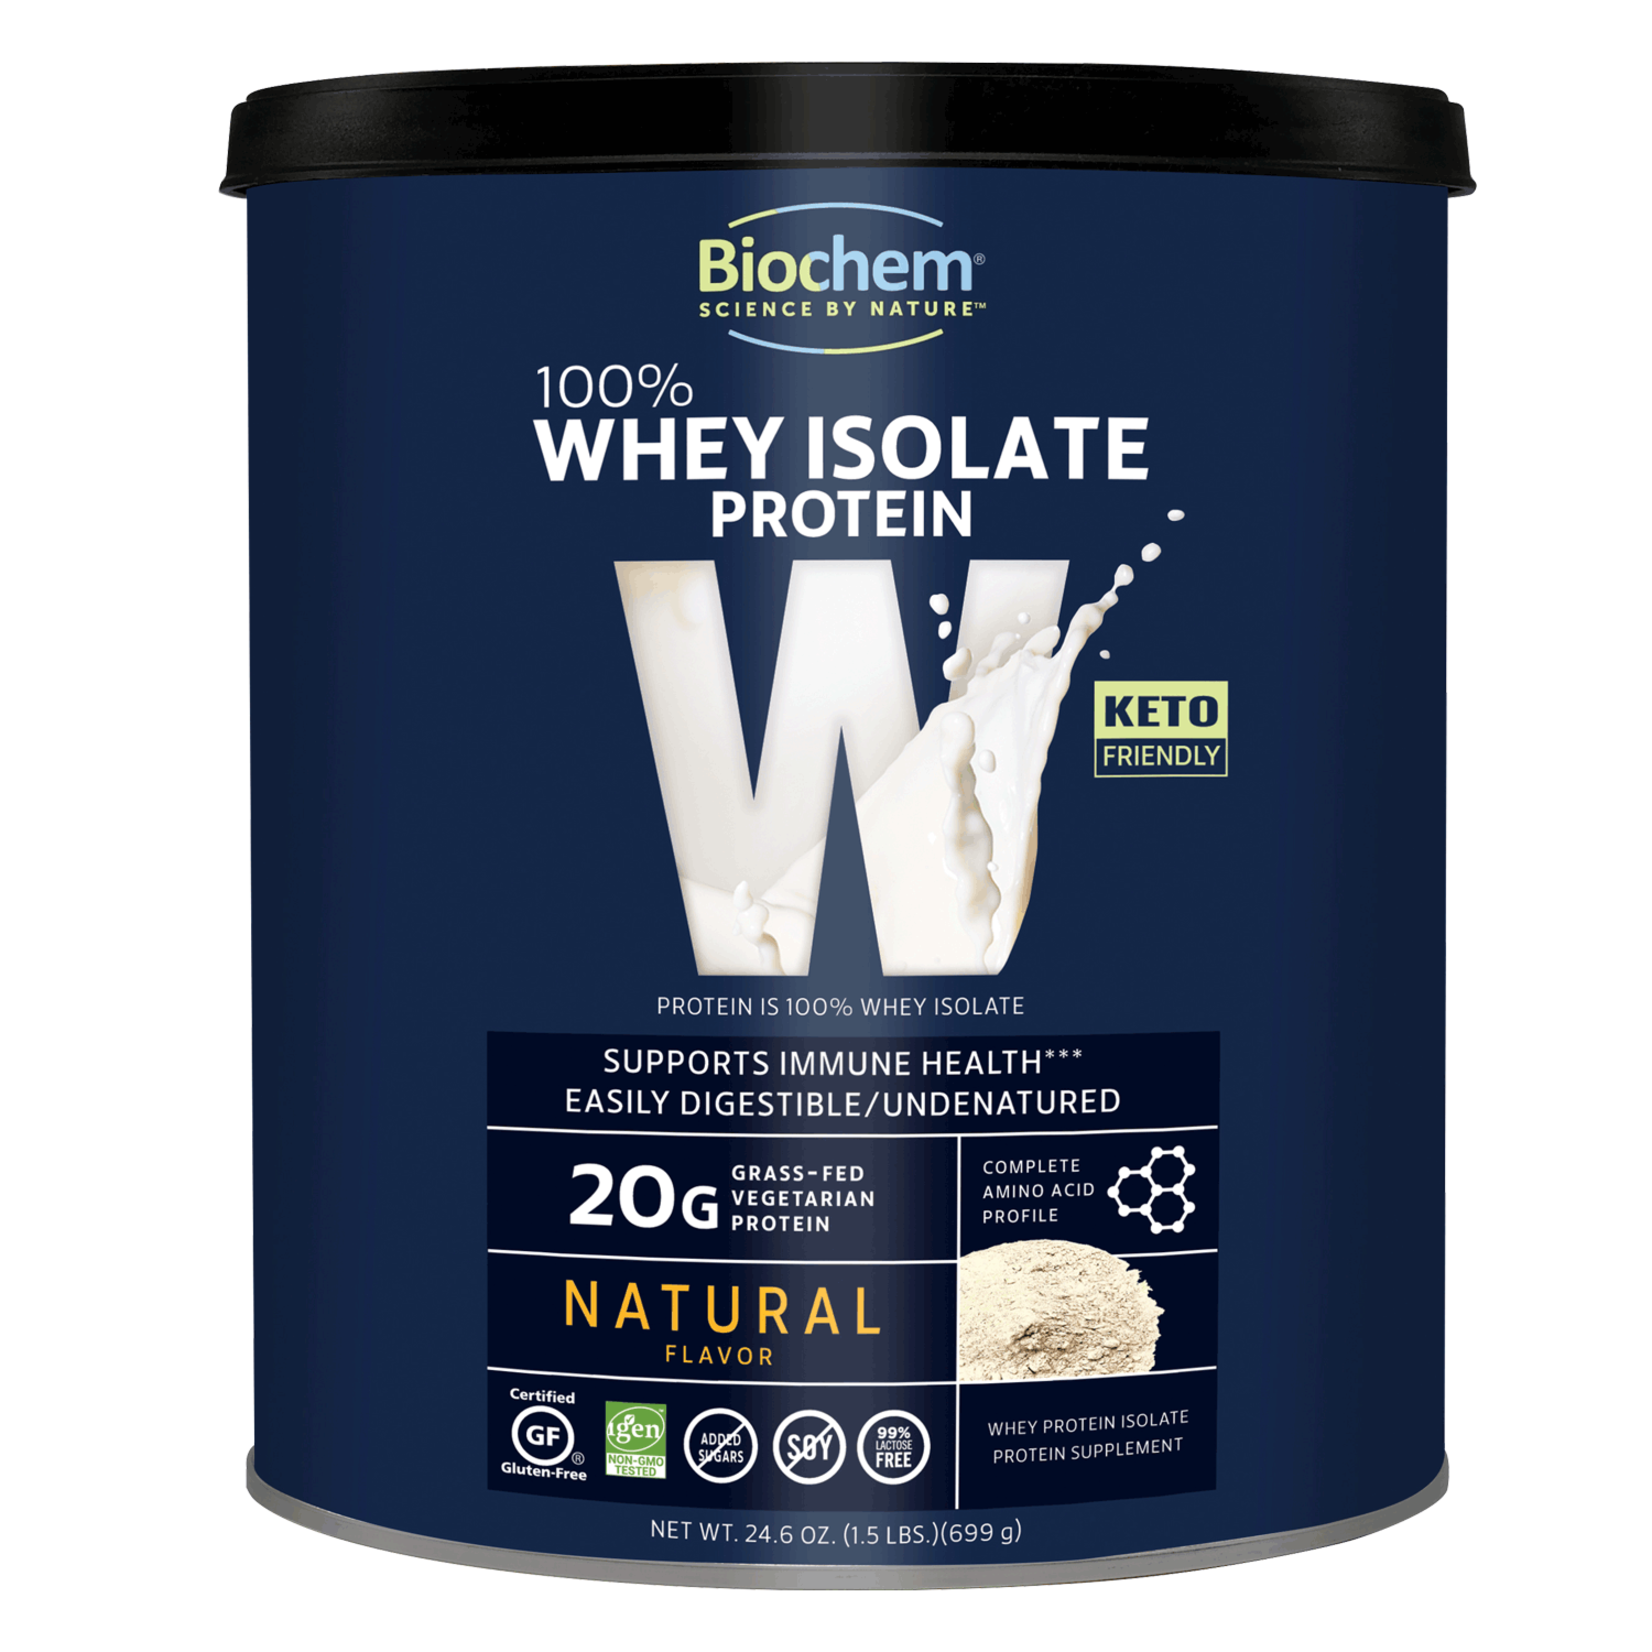 BioChem BioChem Whey Isolate Protein Natural Flavor